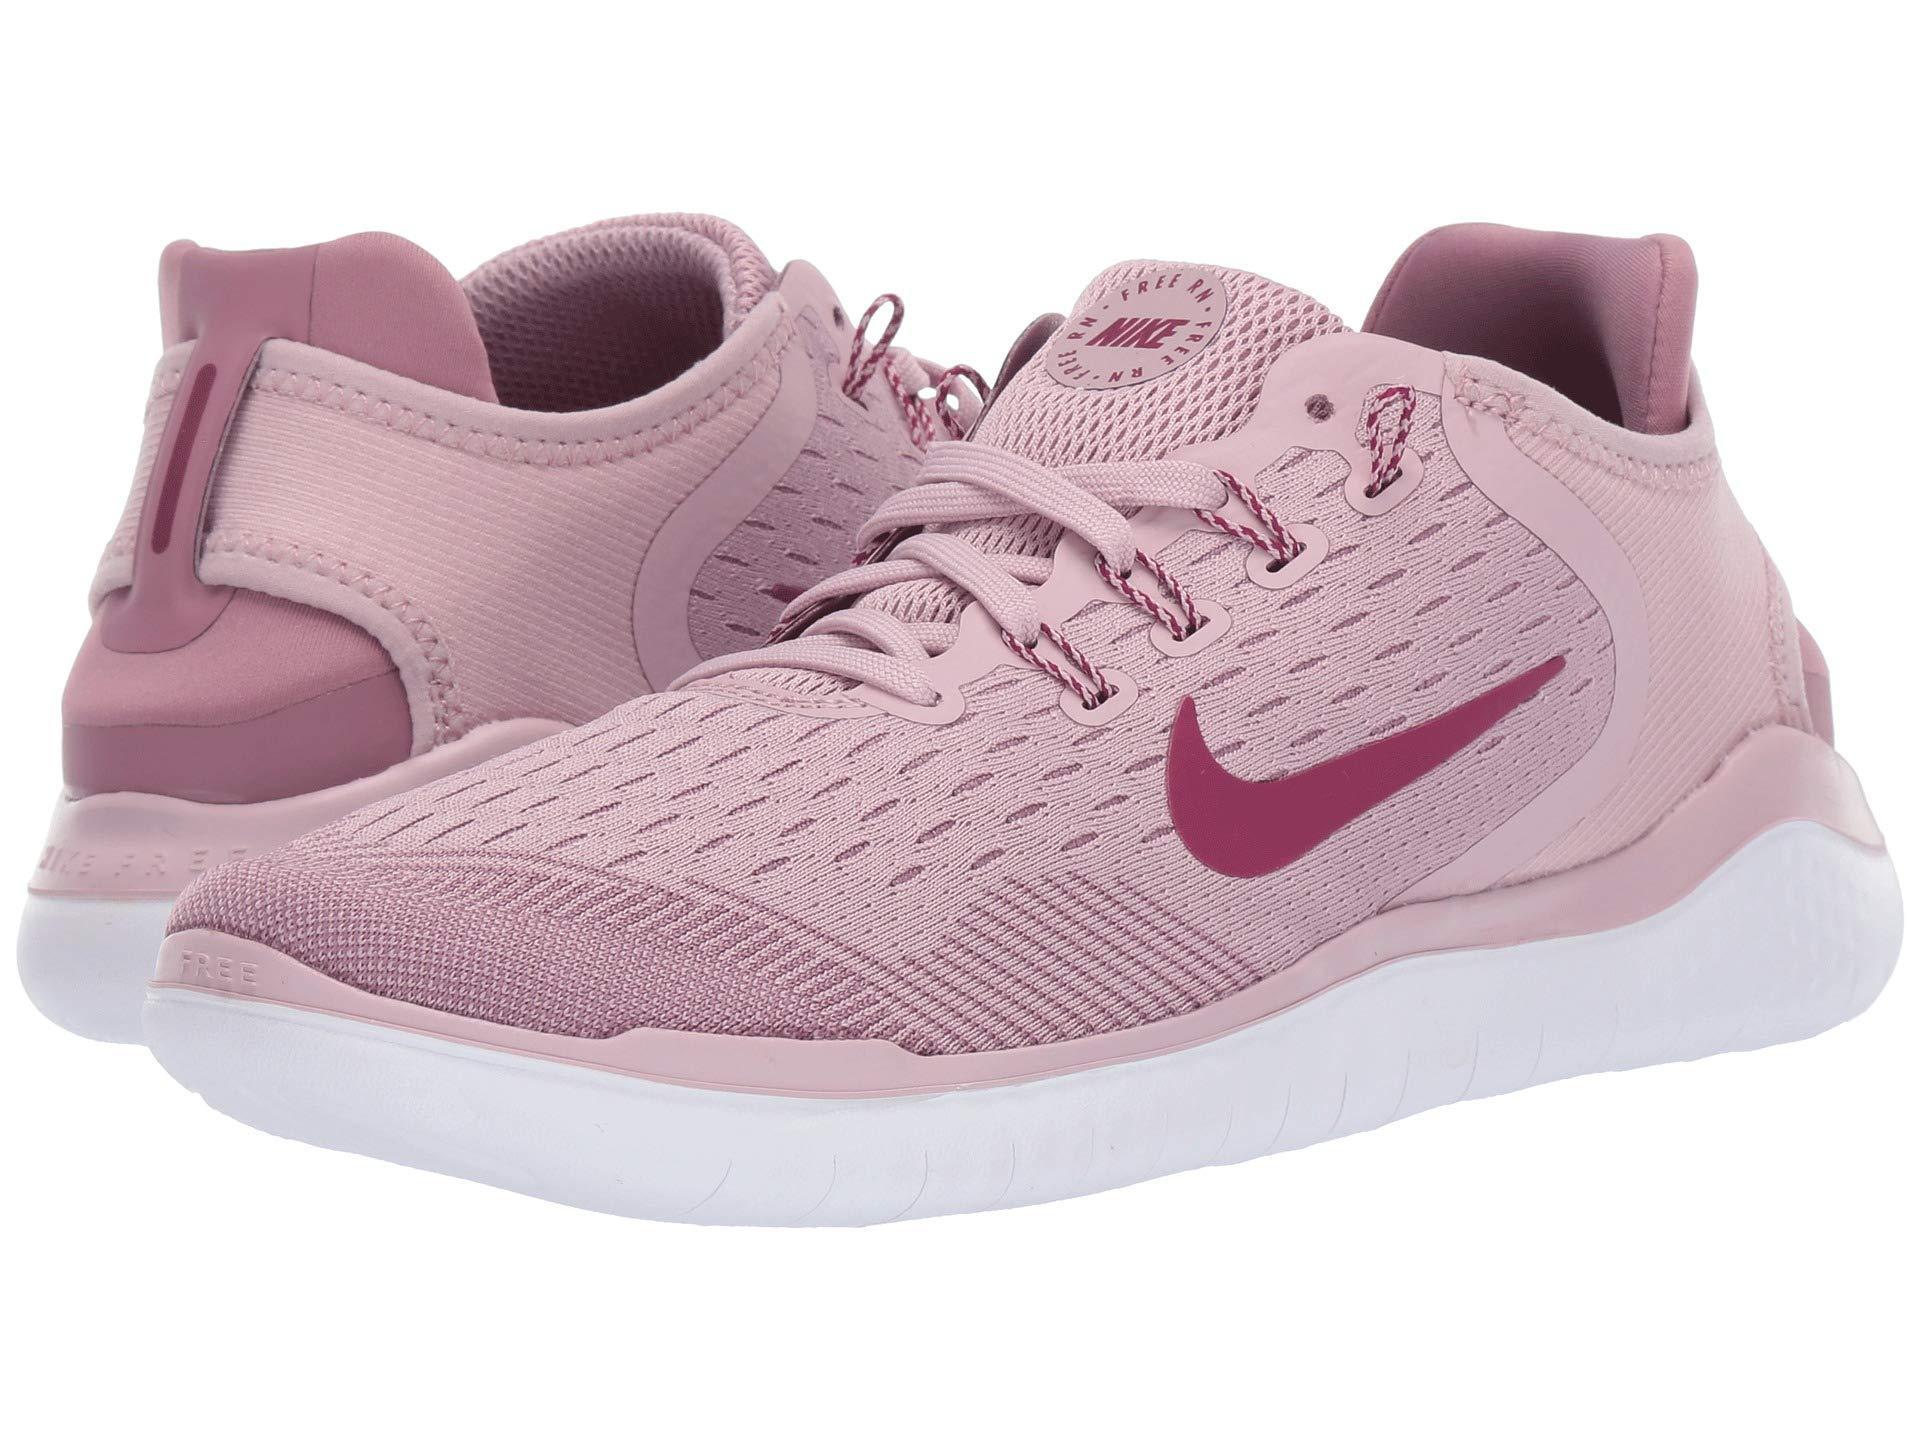 8e2ac4bd5 Nike Free Rn 2018 (plum Chalk/true Berry/plum Dust) Women's Running ...